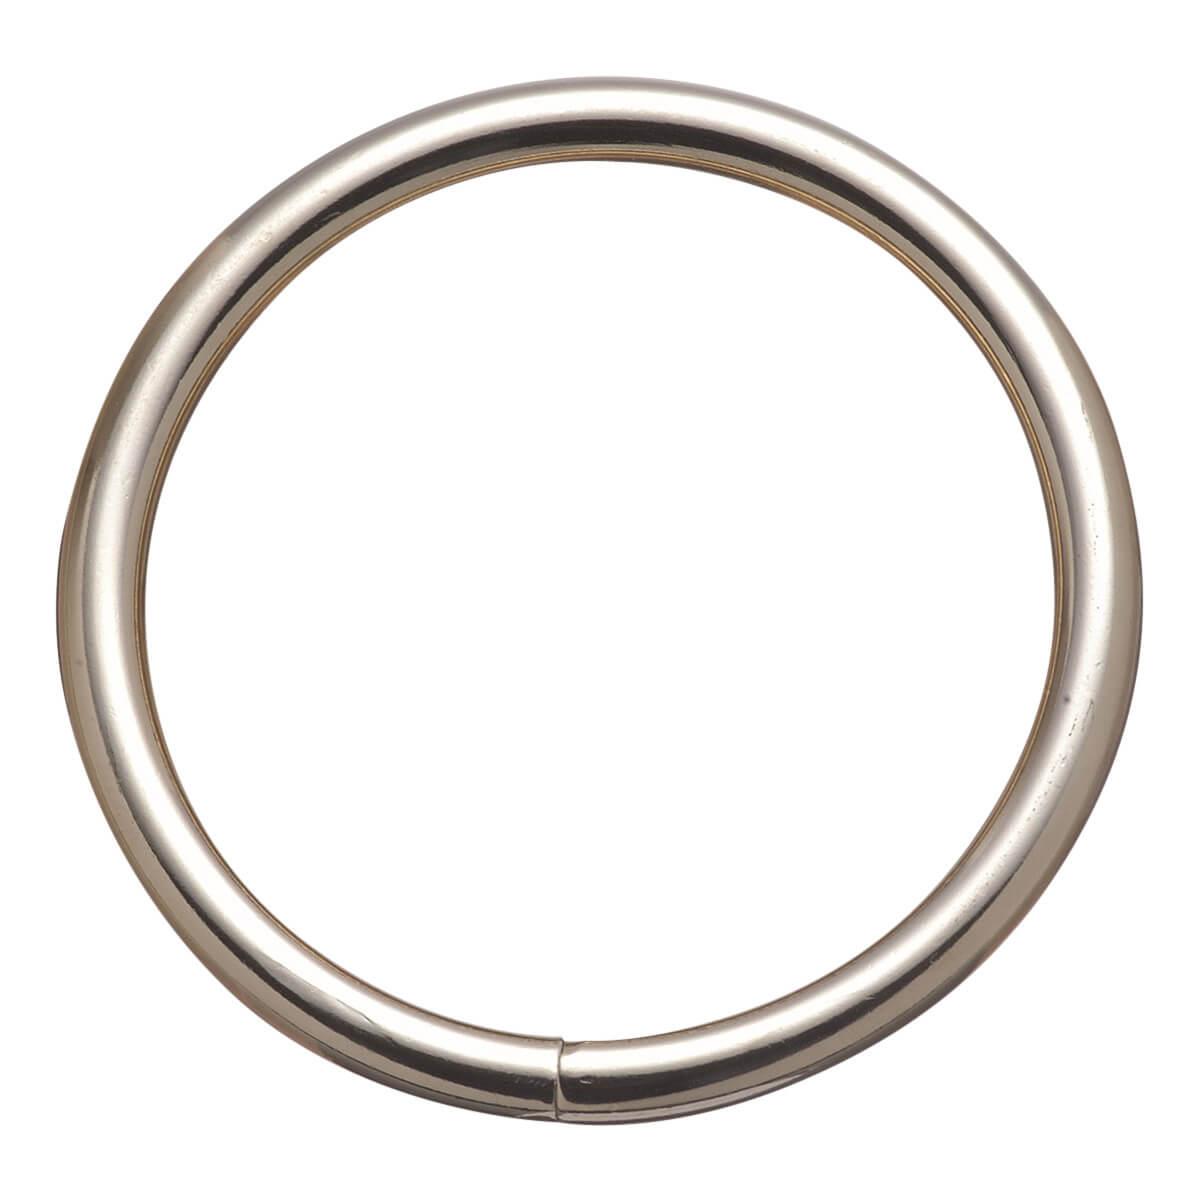 Harness Rings Welded - 1-1/2-in Nickel Plated